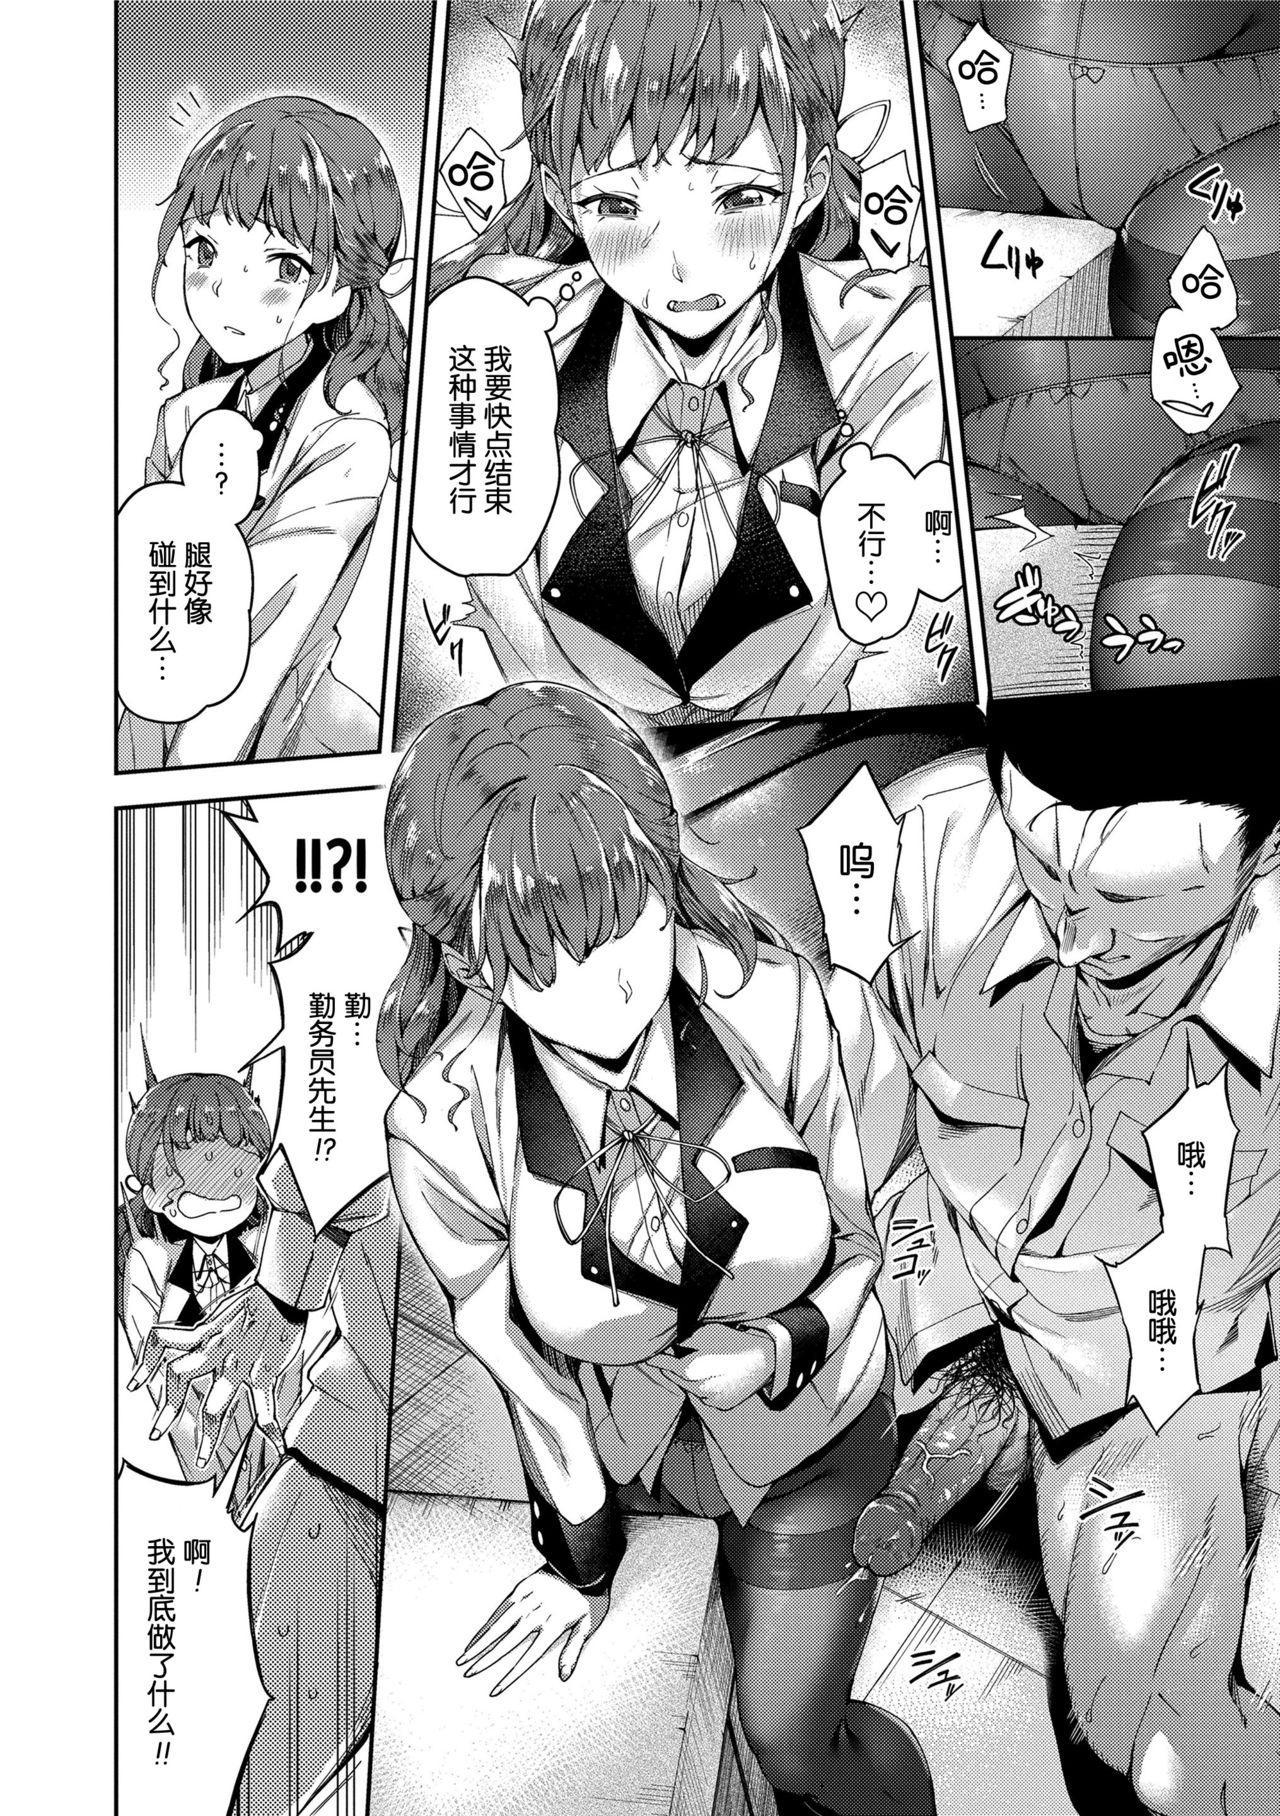 [sugarBt] Ai ga Nakutemo Ecchi wa Dekiru! - Even if There is No Love You Can H! Ch. 1-2 [Chinese] [Decensored] 5